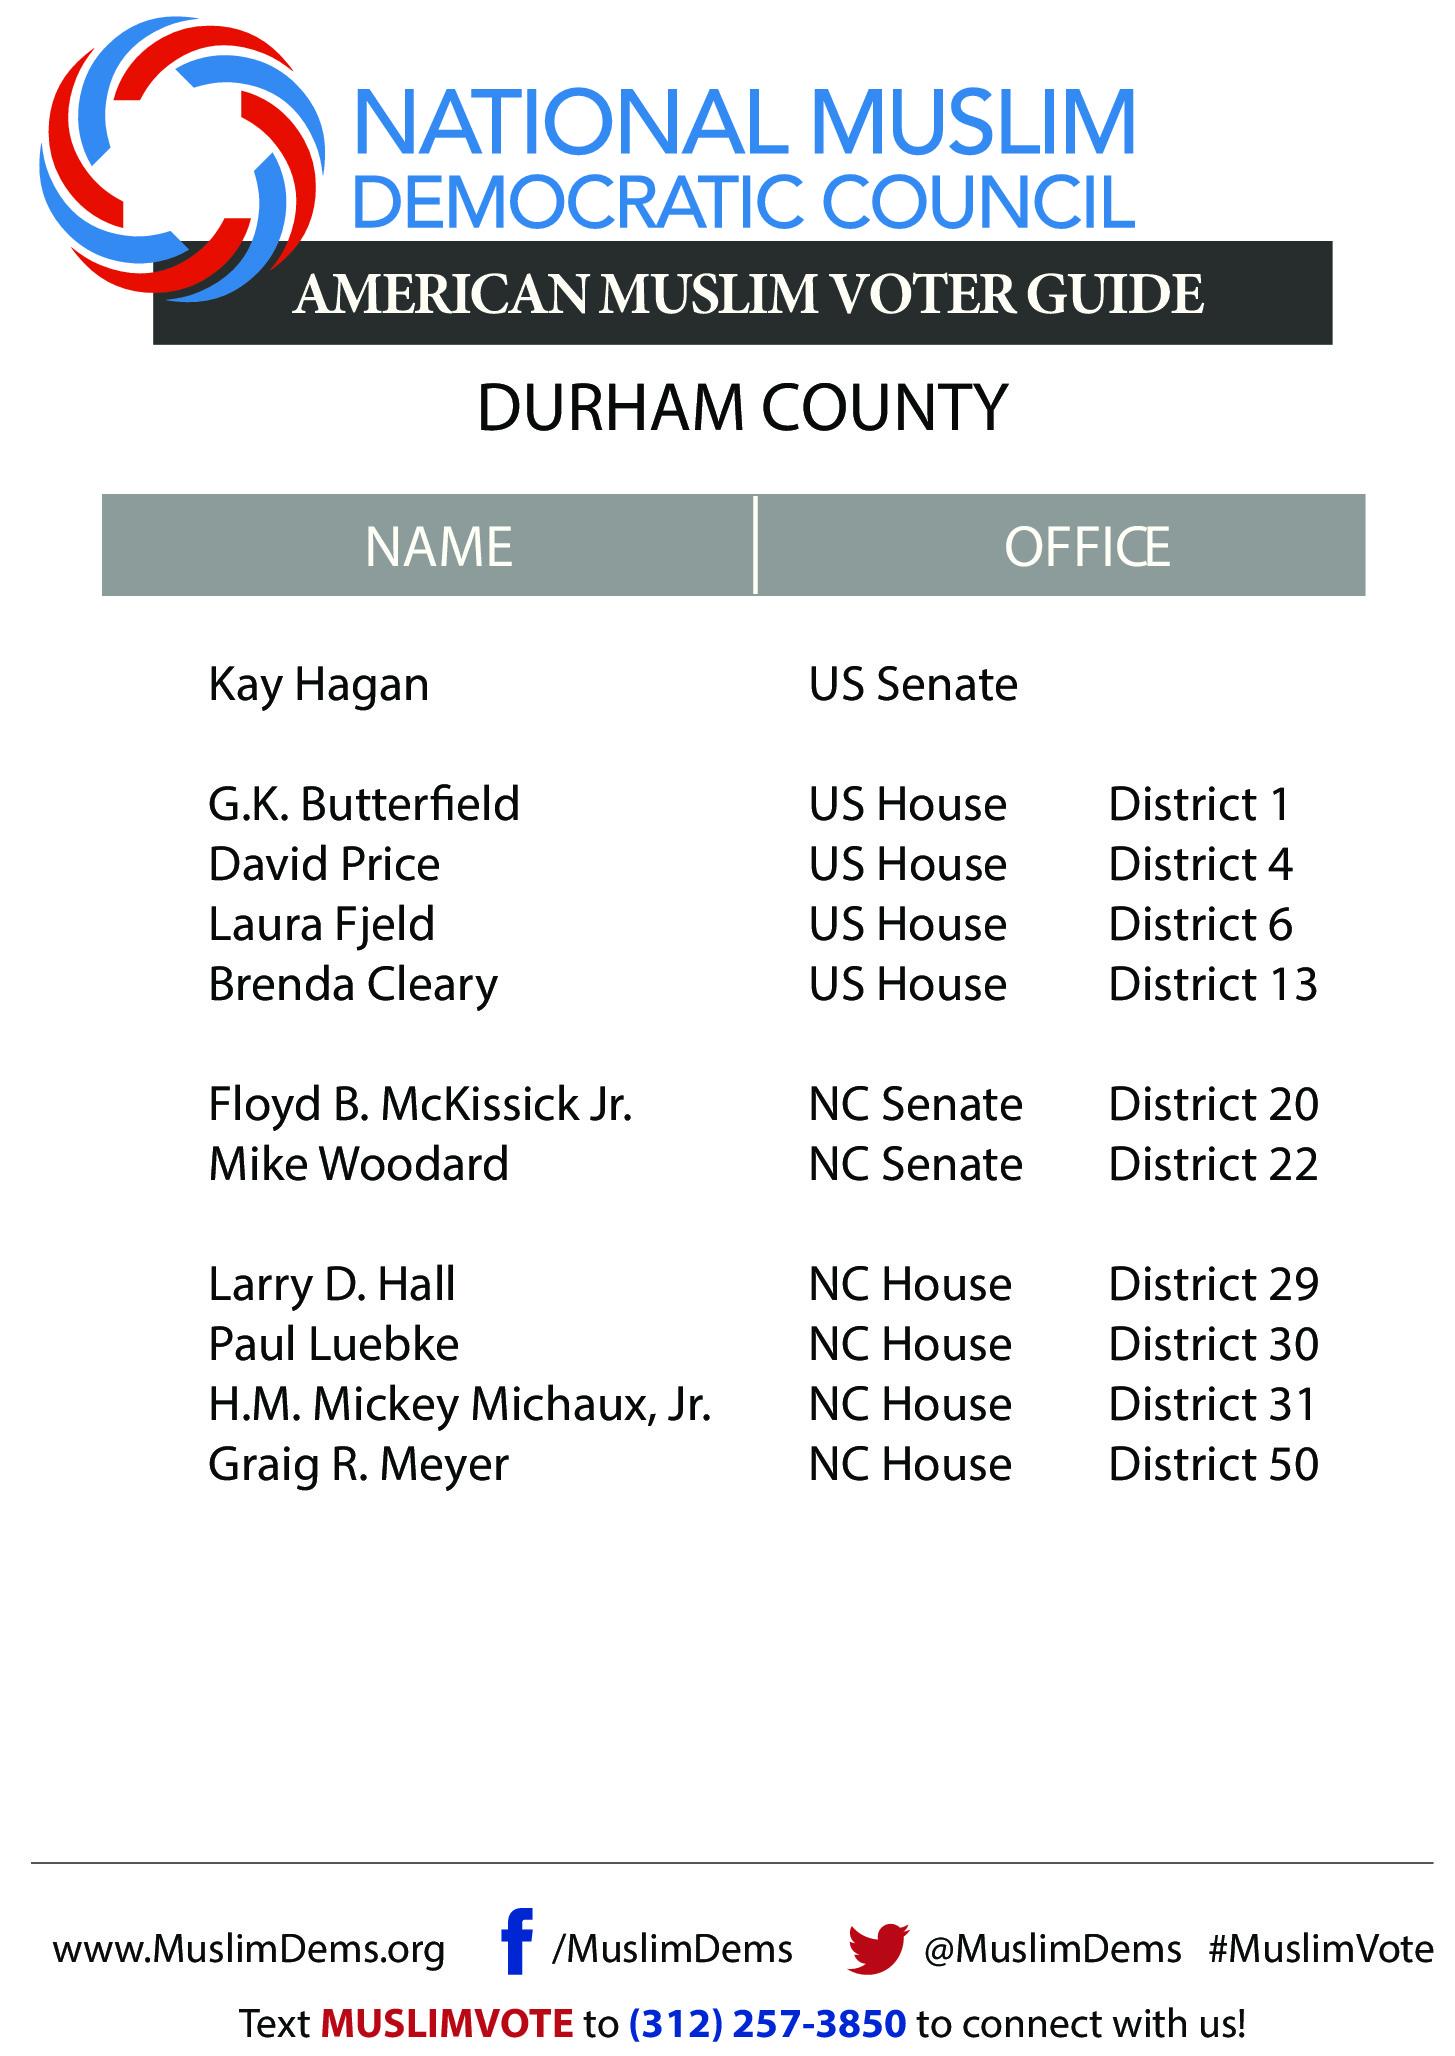 DurhamNC_2014-page-0.jpg